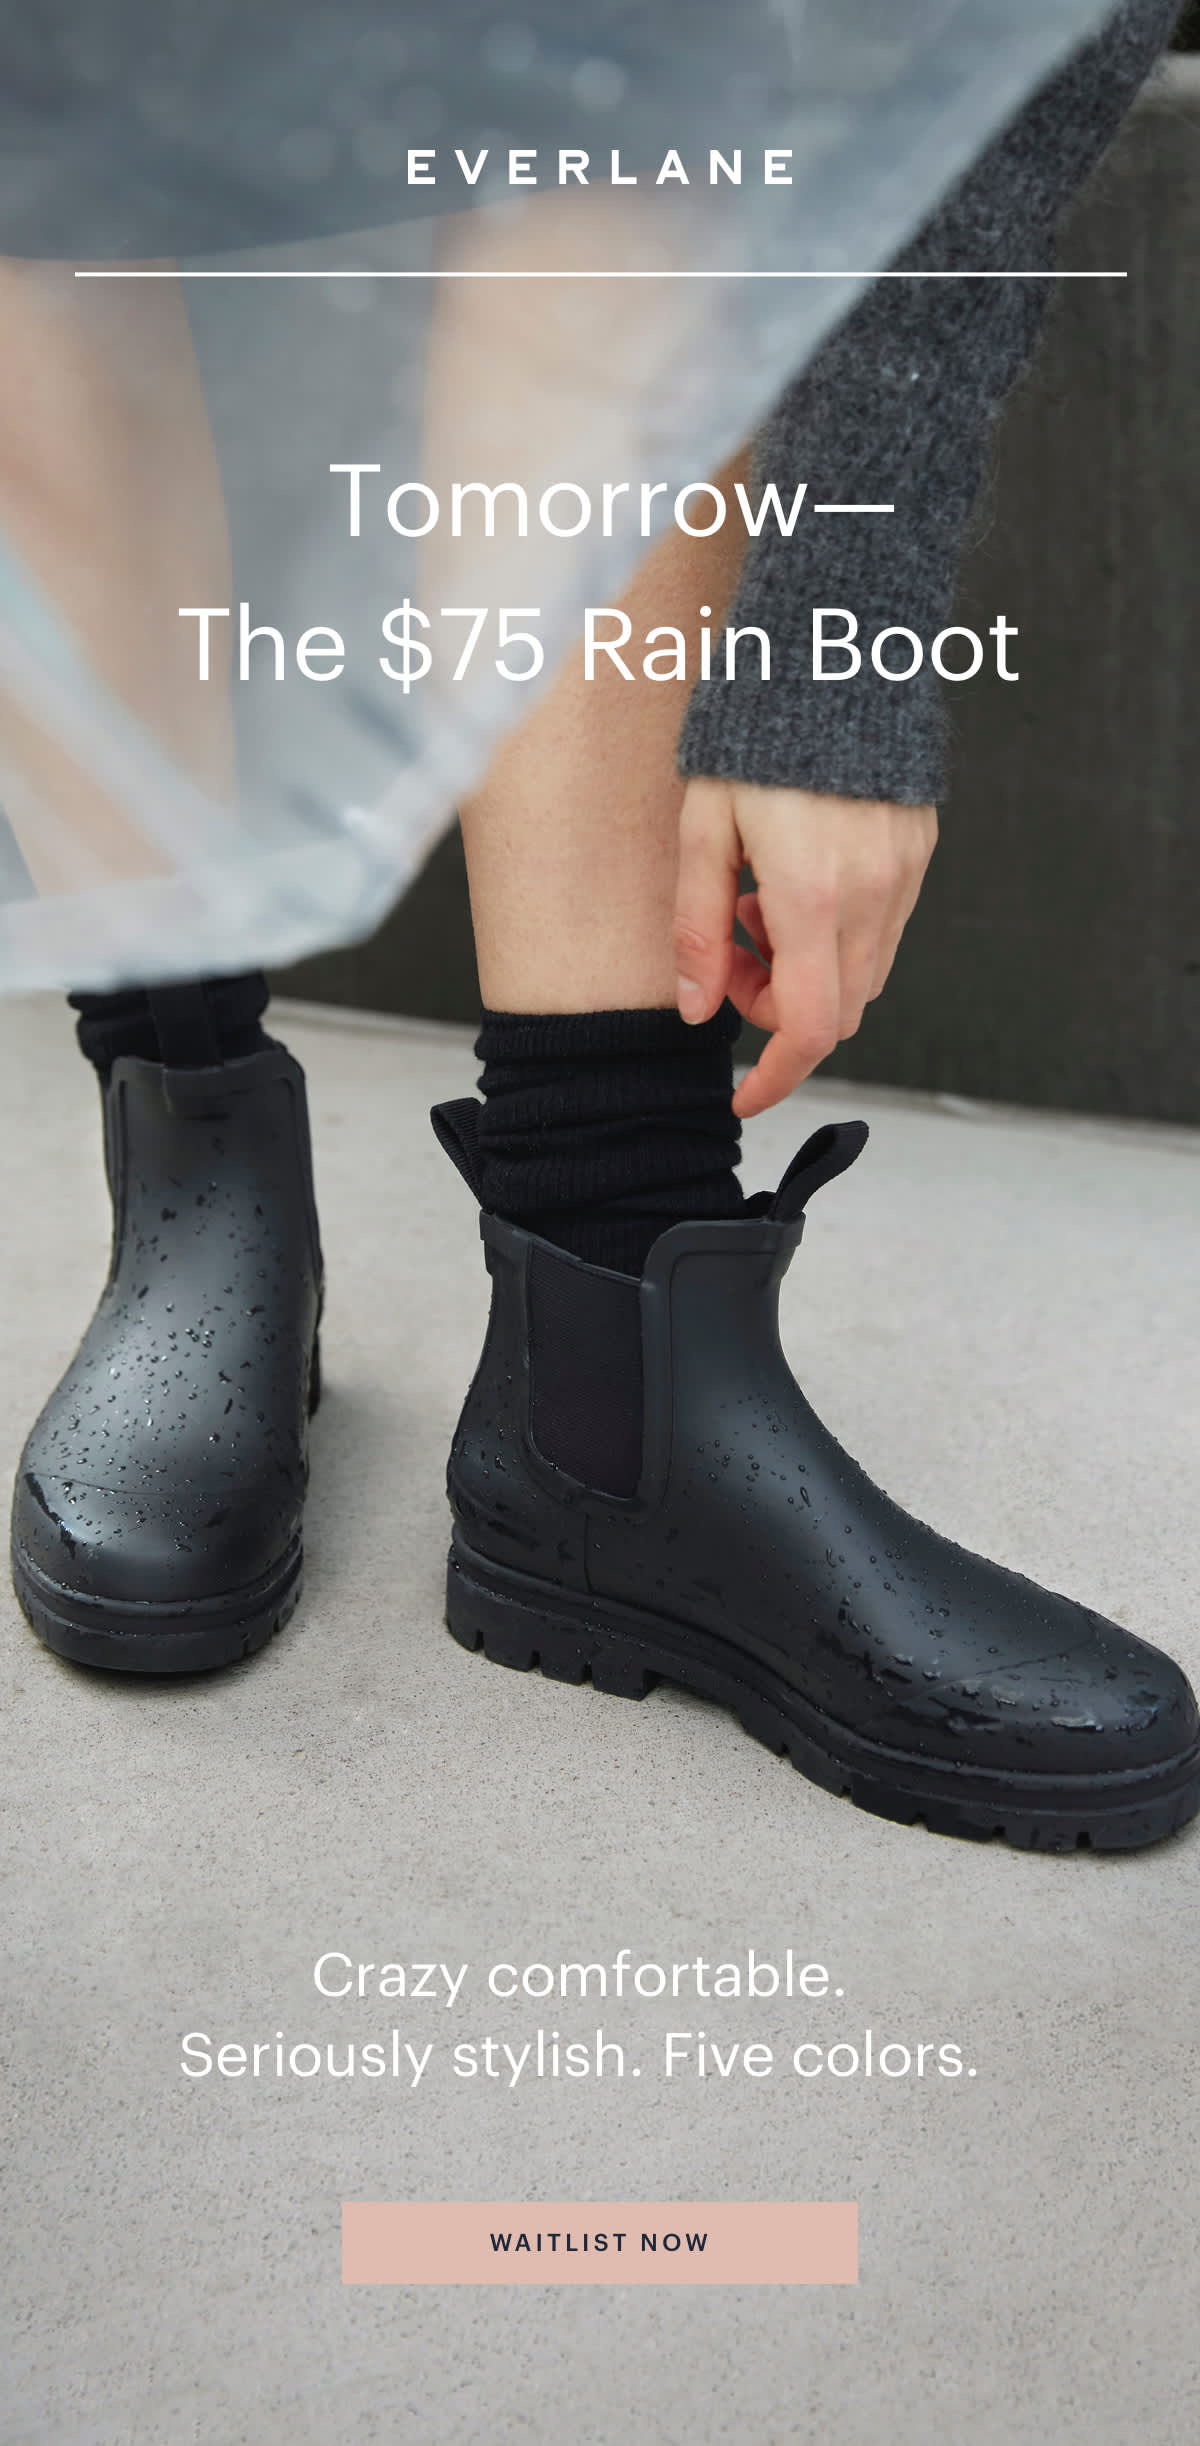 Tomorrow — The $75 rain boot.